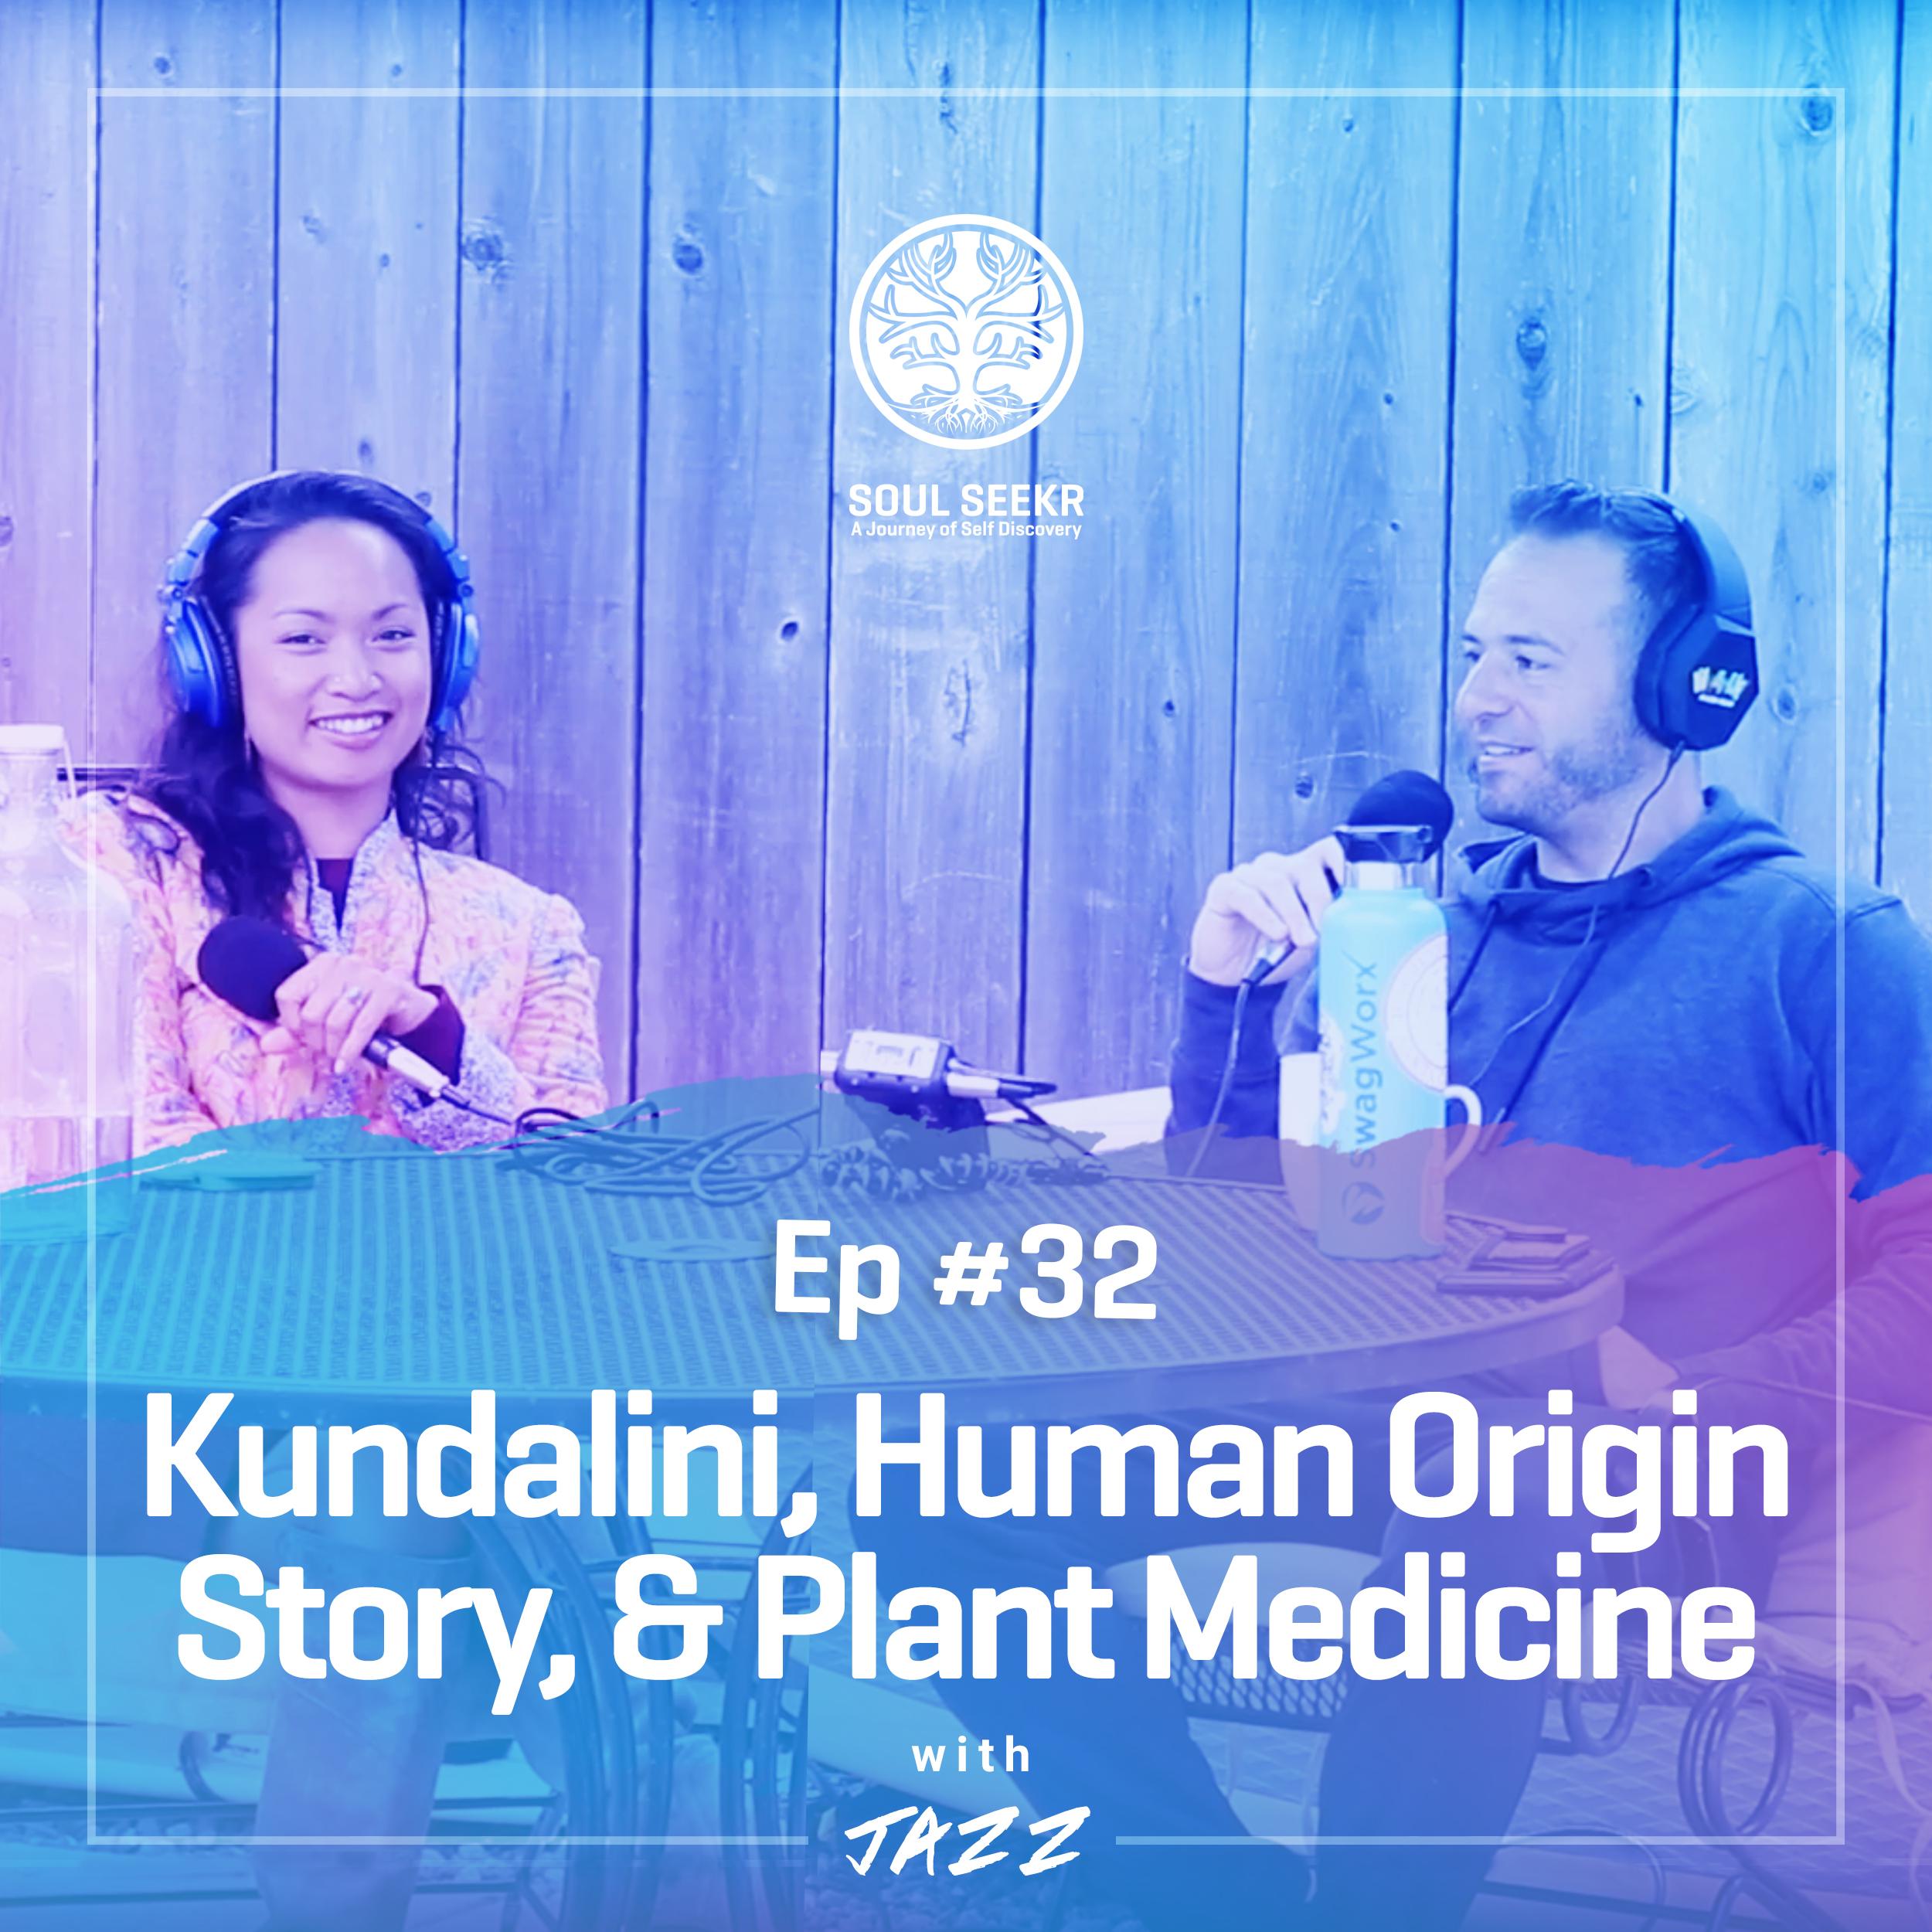 #32: Kundalini, Human Origin Story, & Plant Medicine with Jazz